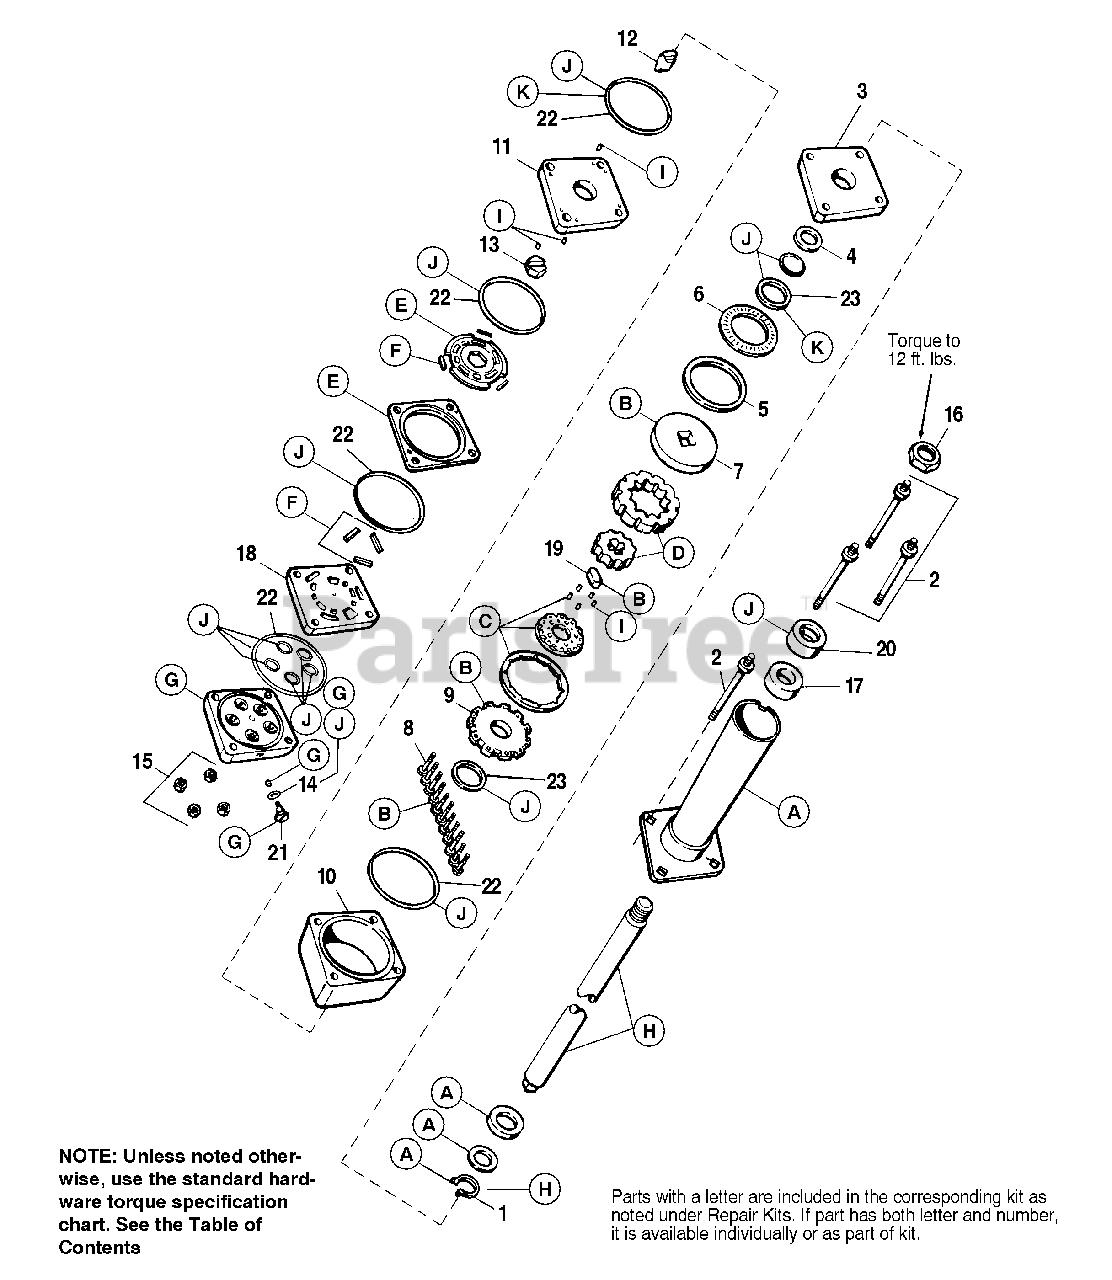 Massey Ferguson 2918 H 1692525 Massey Ferguson Garden Tractor 18hp Power Steering Unit Parts Lookup With Diagrams Partstree